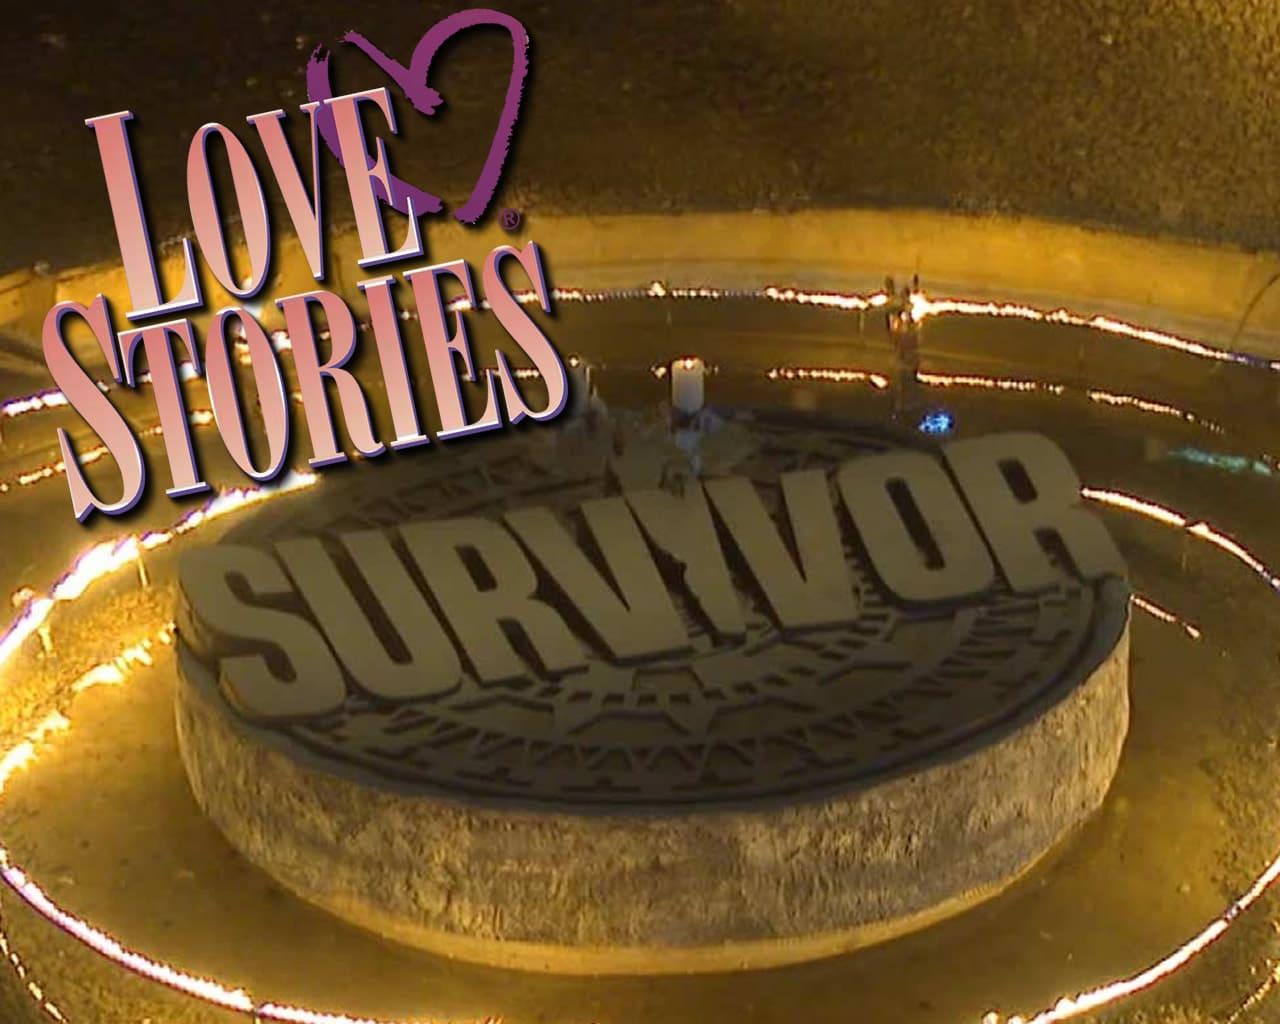 Survivor spoiler διαρροή, survivor spoiler διαρροή ασυλια σημερα, survivor spoiler διαρροή επαθλο, survivor spoiler διαρροή υποψηφιοι, survivor spoiler διαρροή ασυλια, survivor spoiler διαρροή αποχωρηση, survivor spoiler διαρροή, survivor spoiler διαρροή επαθλο live,